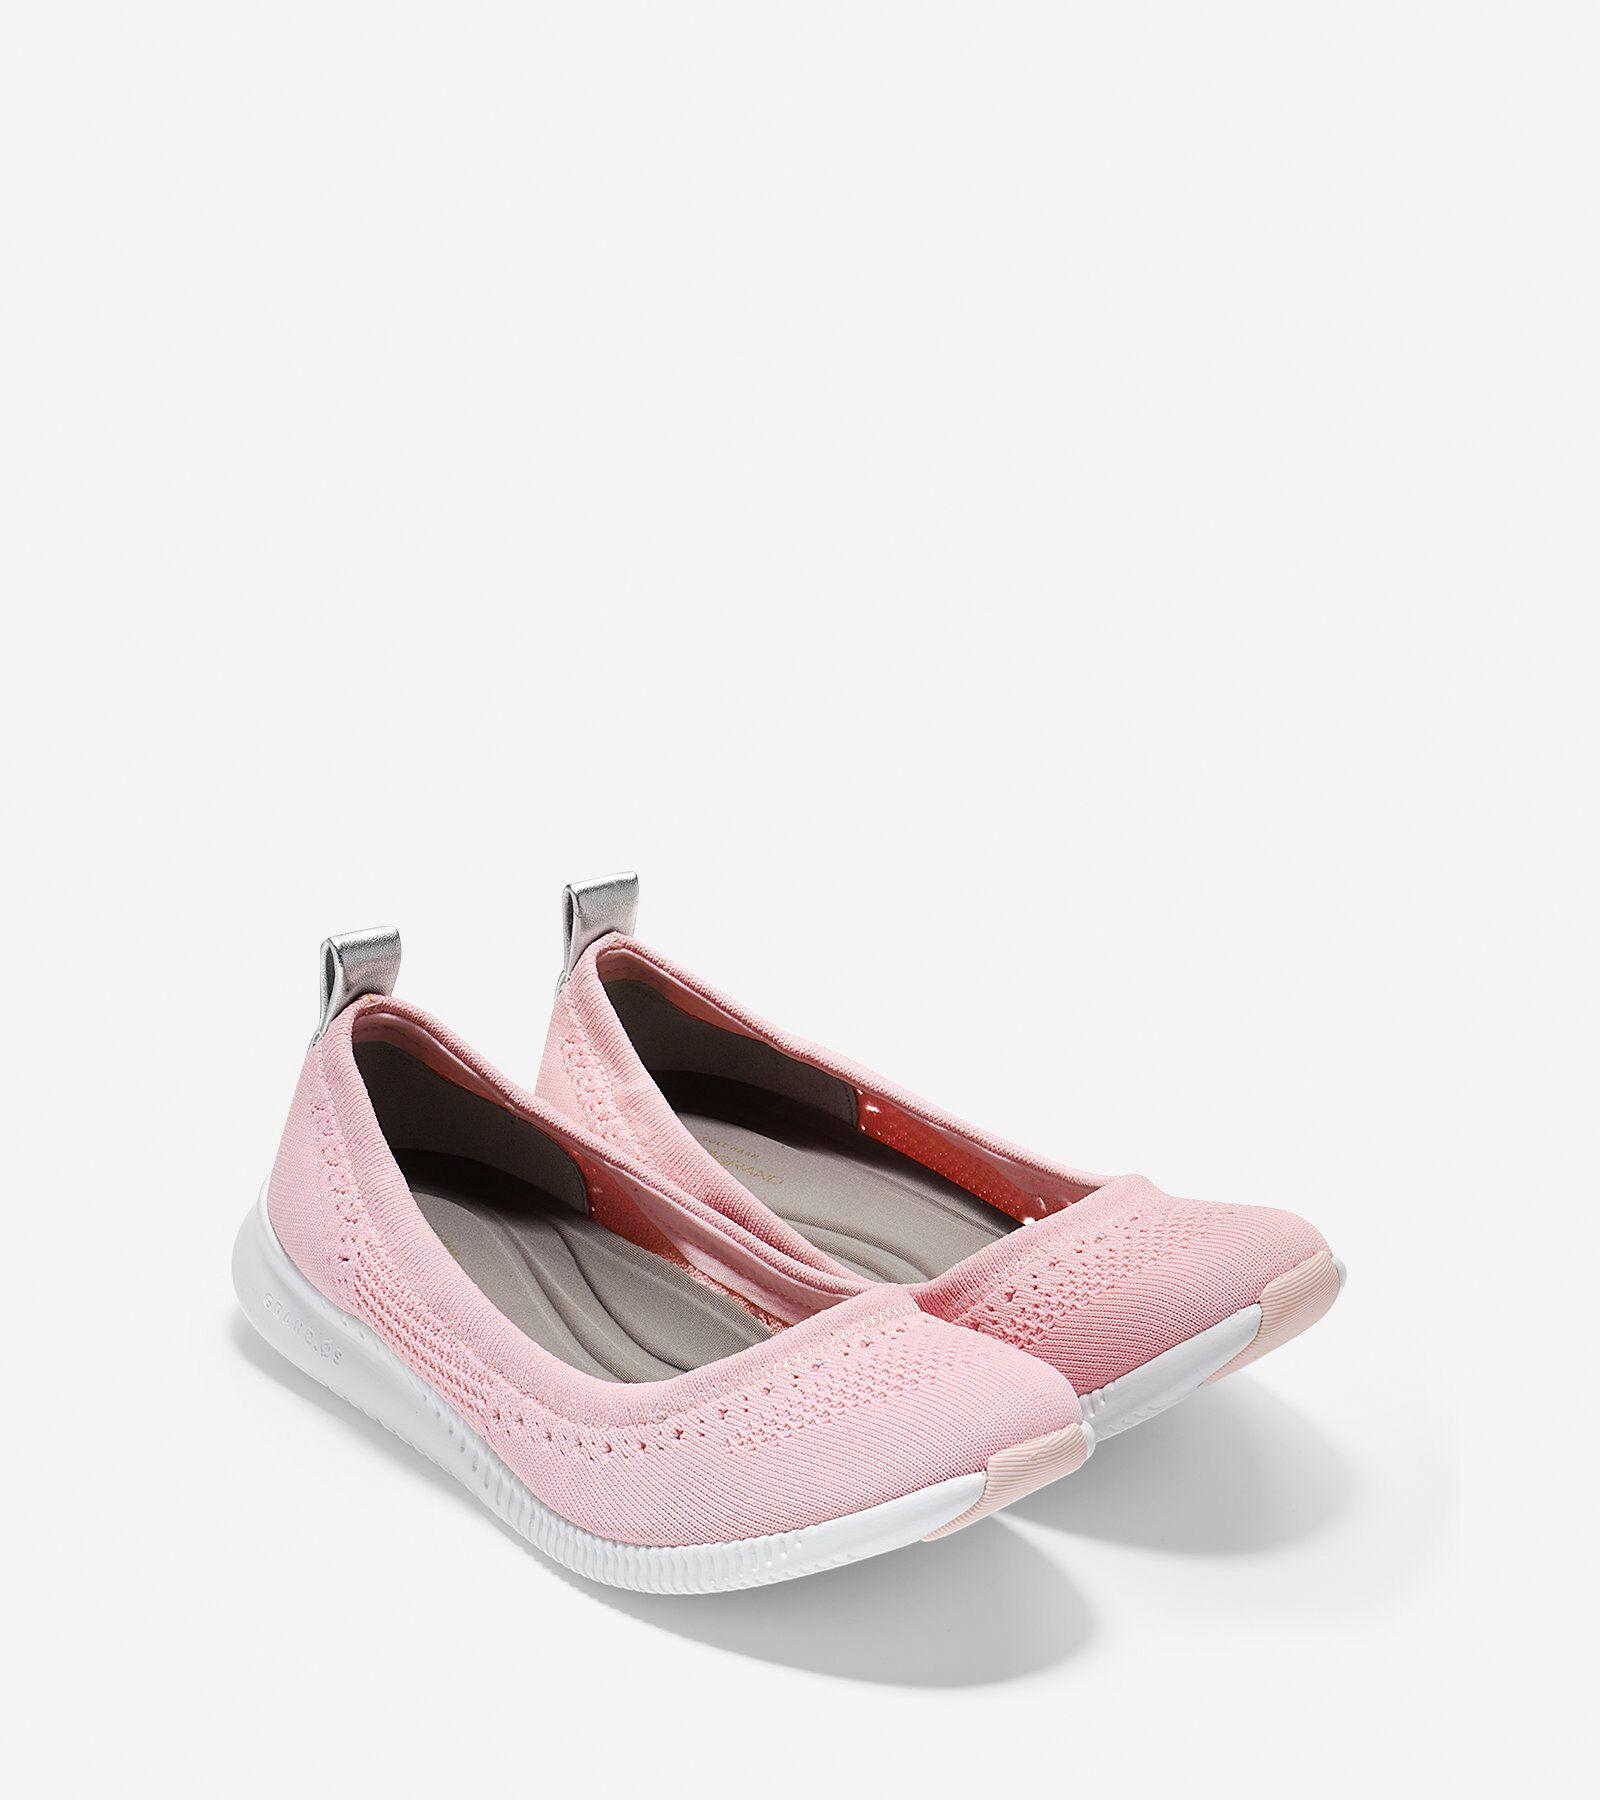 Cole Haan Women's Zerogrand Knit Ballet Flats 5mUeUs0TGR